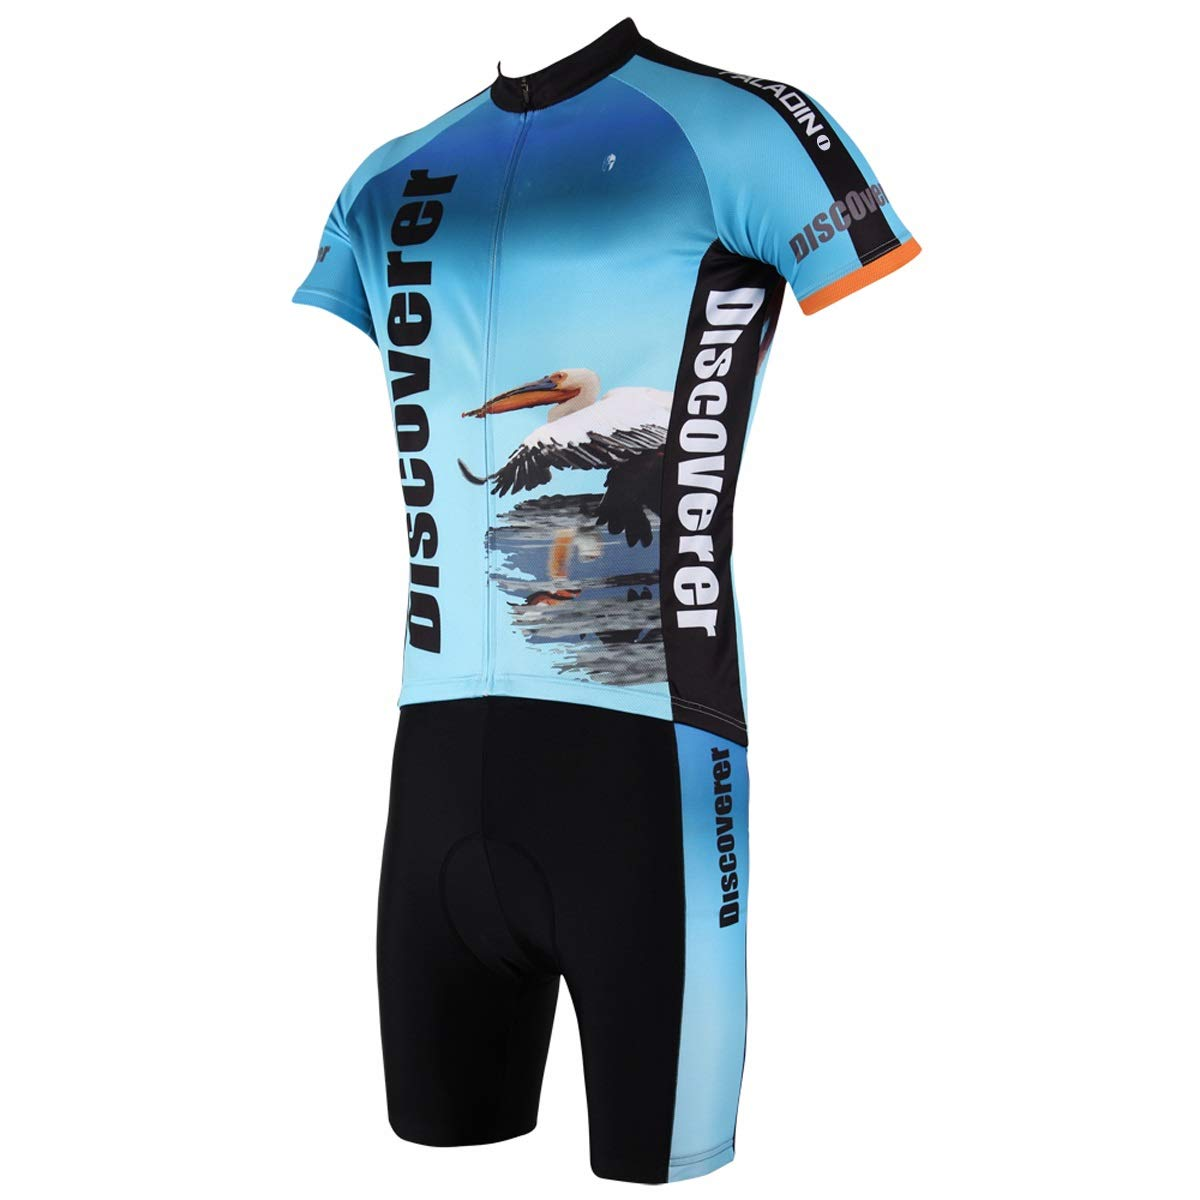 Fahrrad Reitanzug Trikotanzug Herren Mountainbike Ausrüstung Kurzarm Damen Sommer Bike Trikot Fahrradtrikot LPLHJD